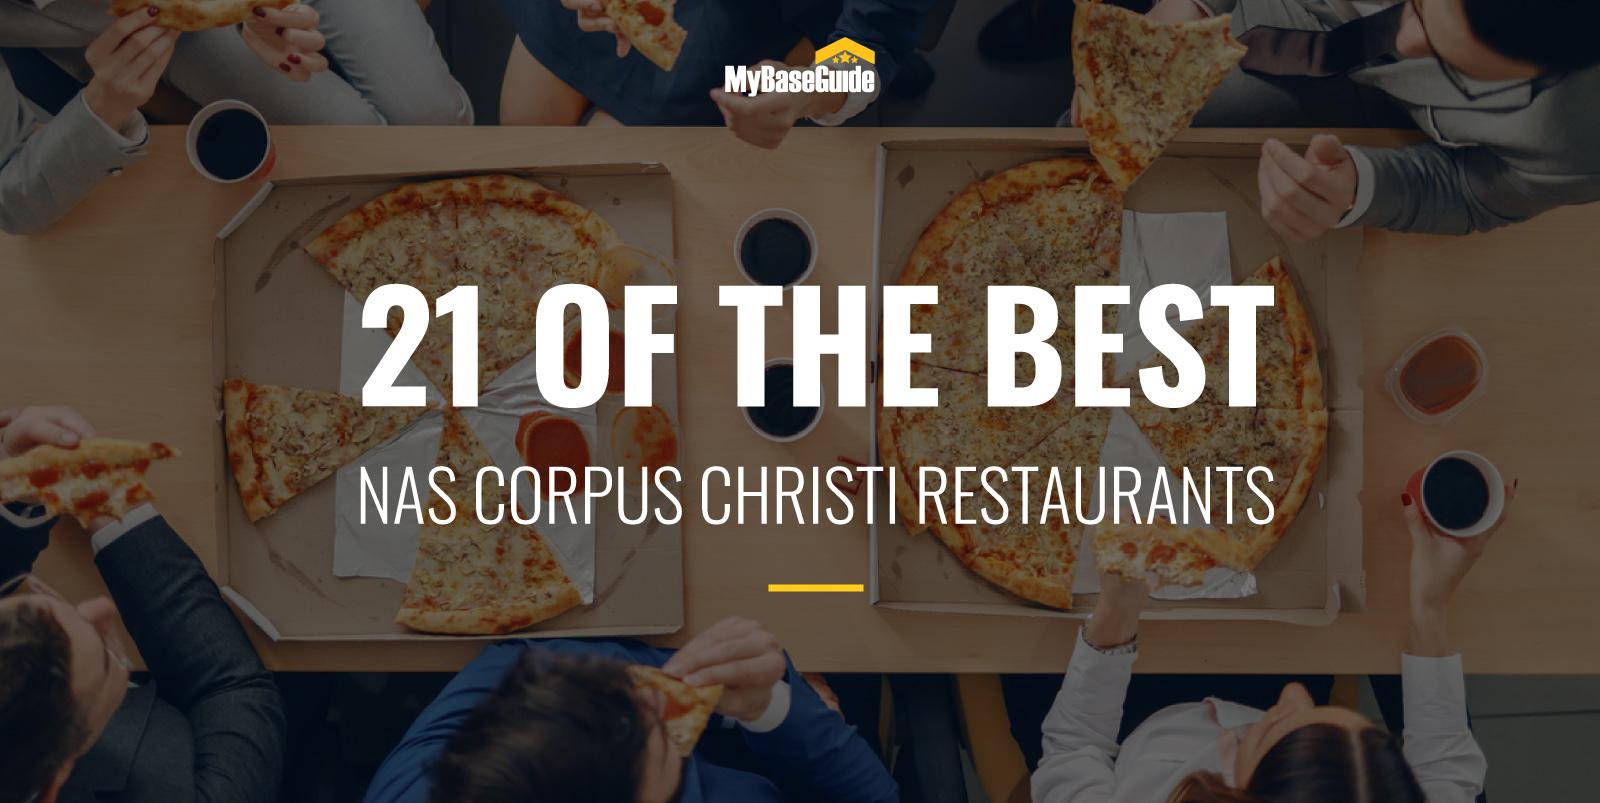 21 of the Best Restaurants Near NAS Corpus Christi